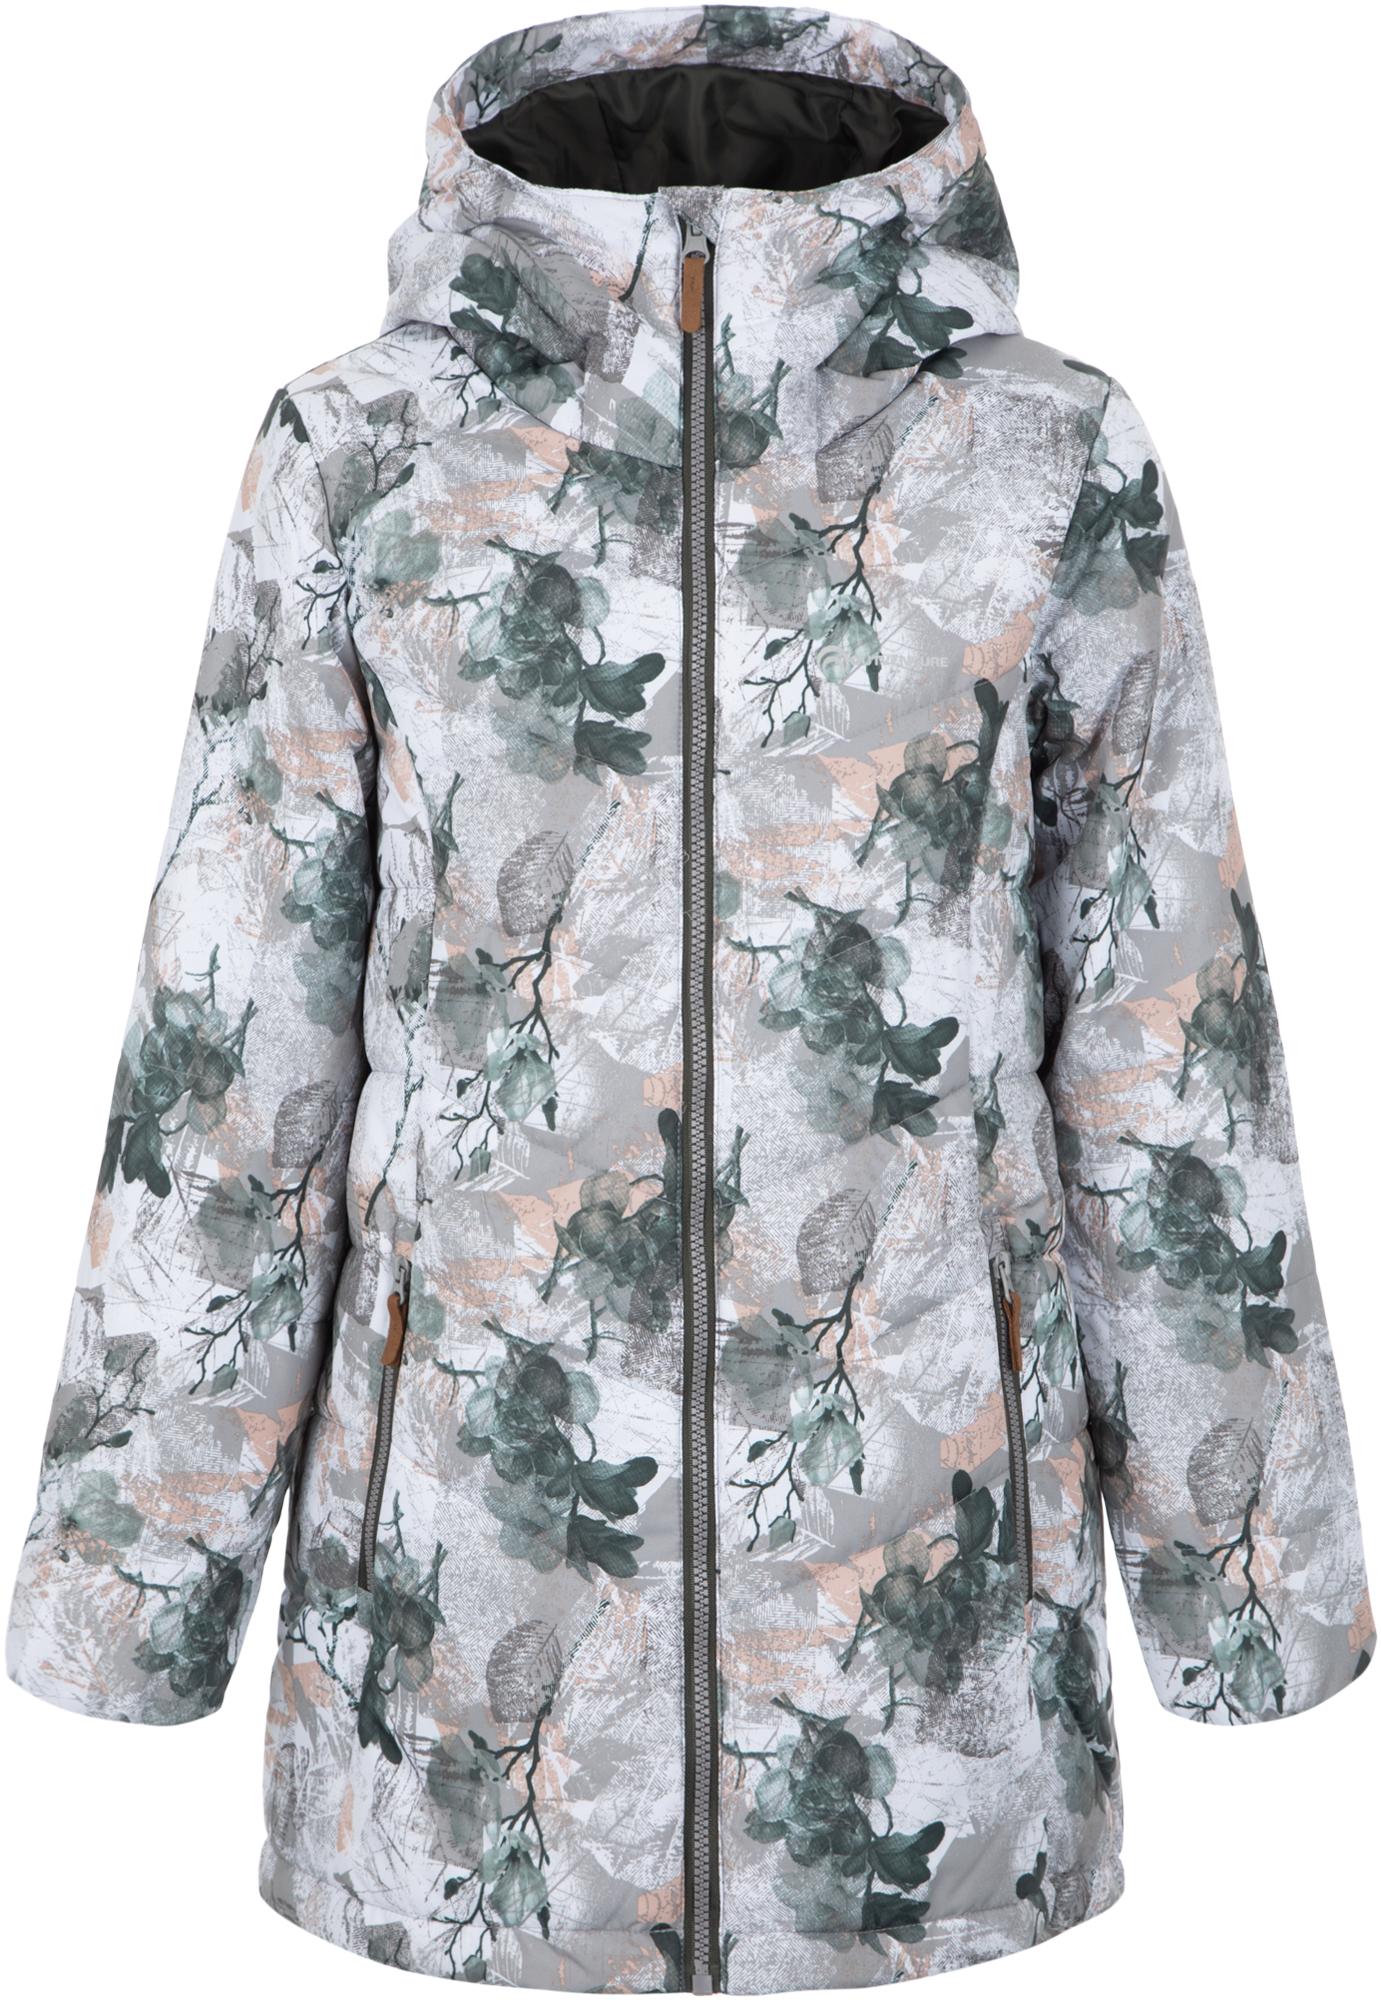 цена на Outventure Куртка утепленная для девочек Outventure, размер 134